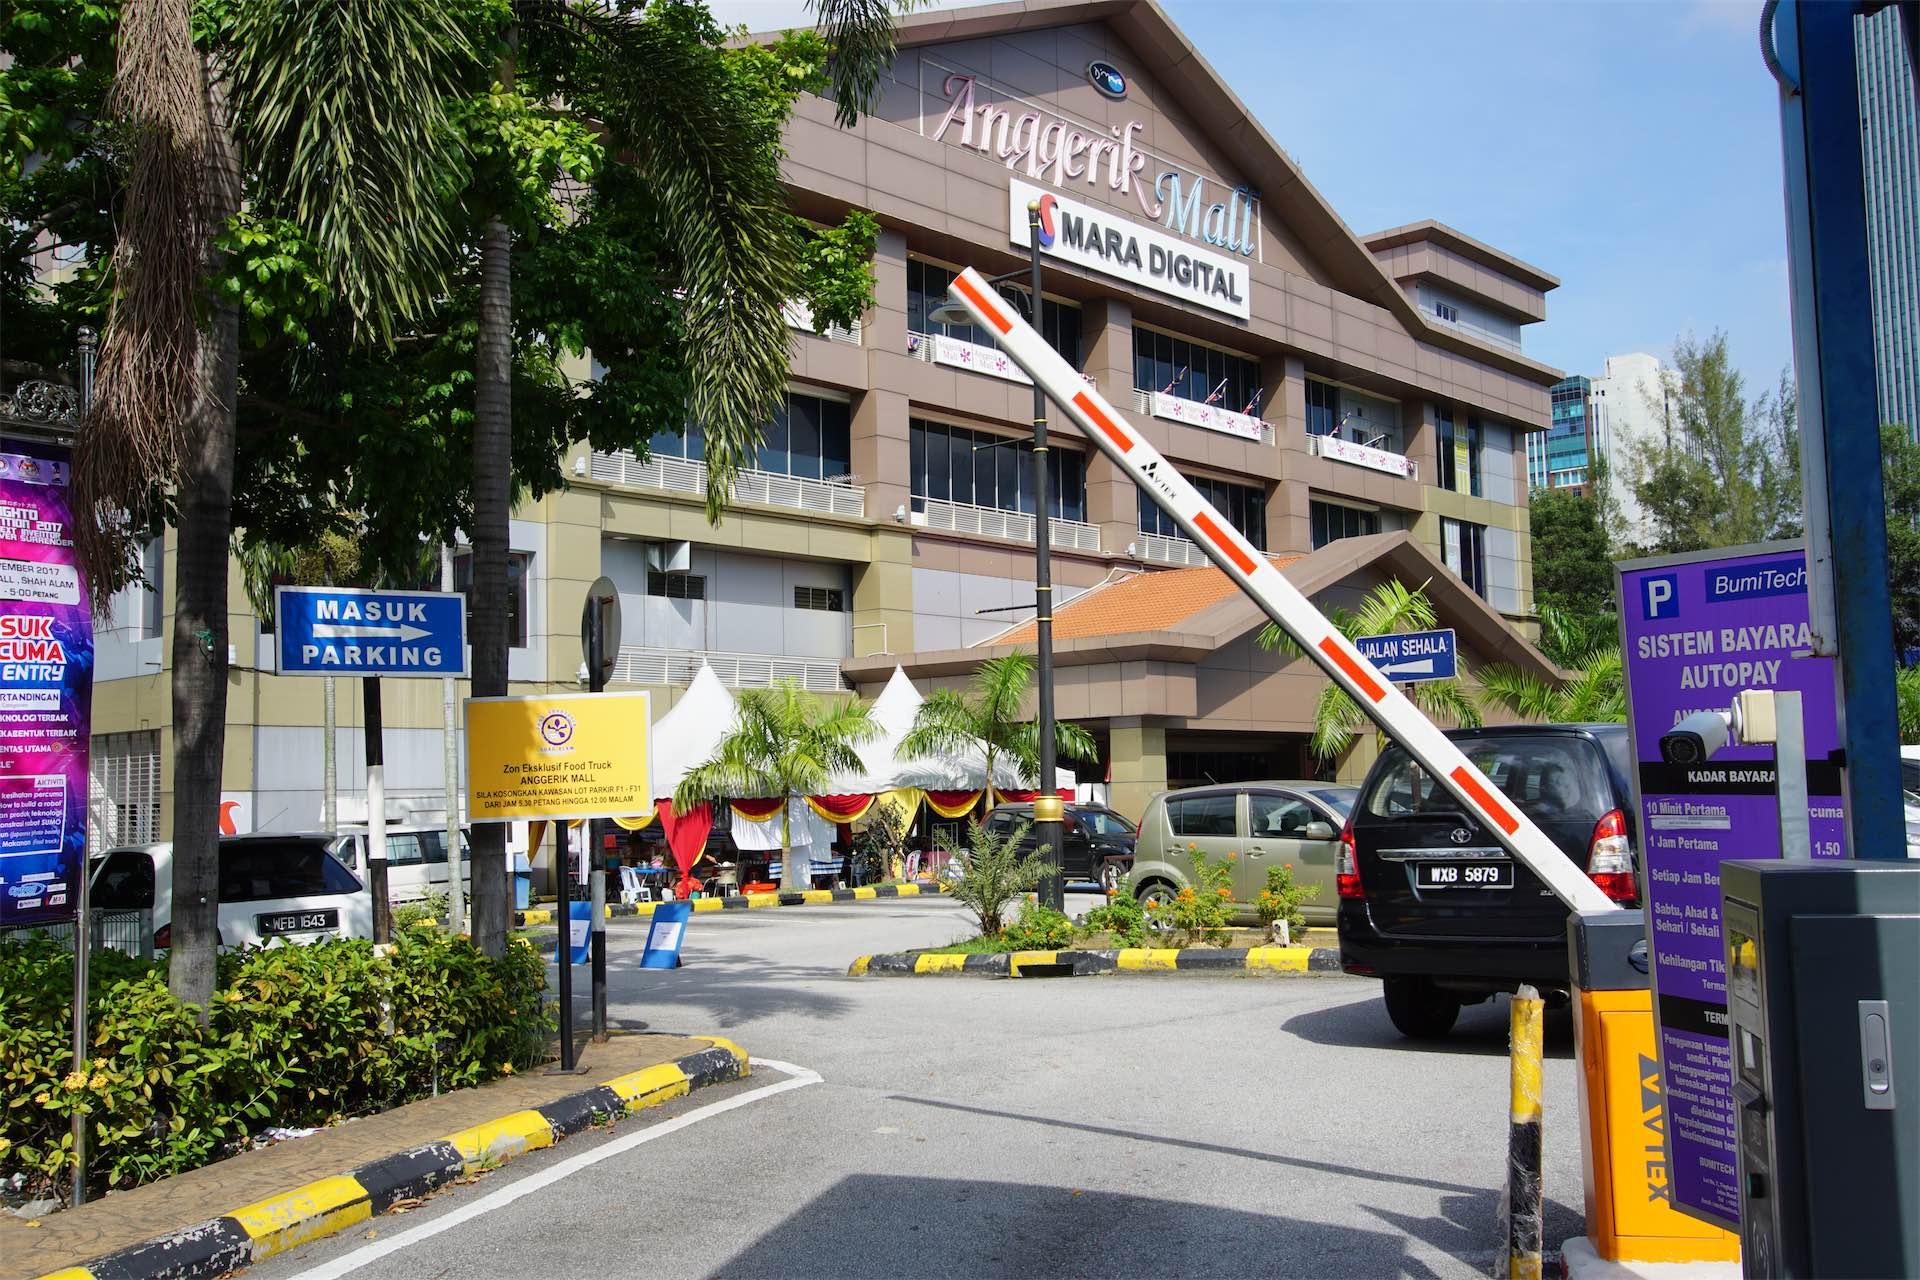 Gate Barrier RGB - Bumitech Marketing Sdn Bhd